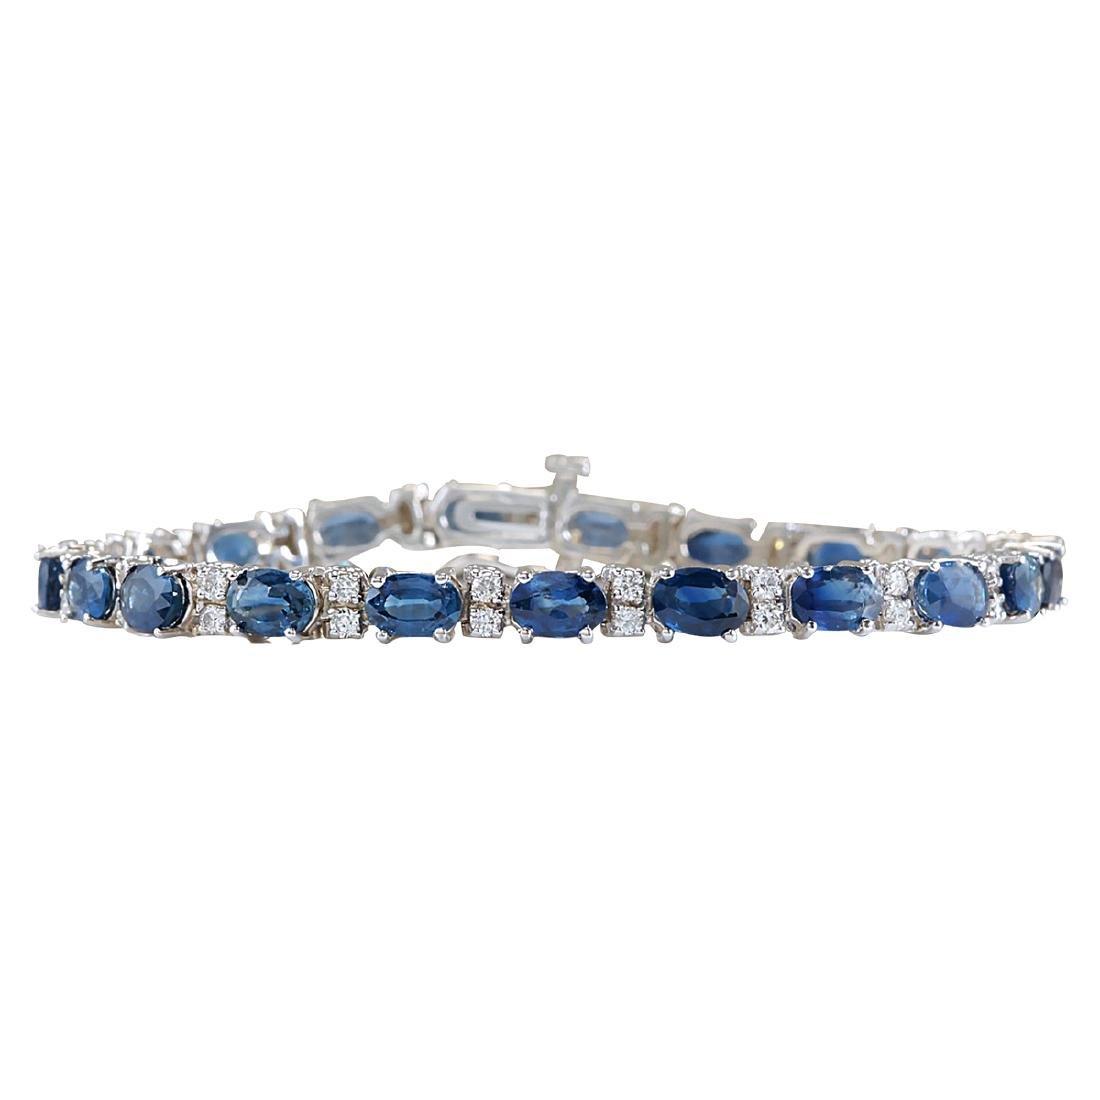 12.80CTW Natural Blue Sapphire Diamond Bracelet 18K